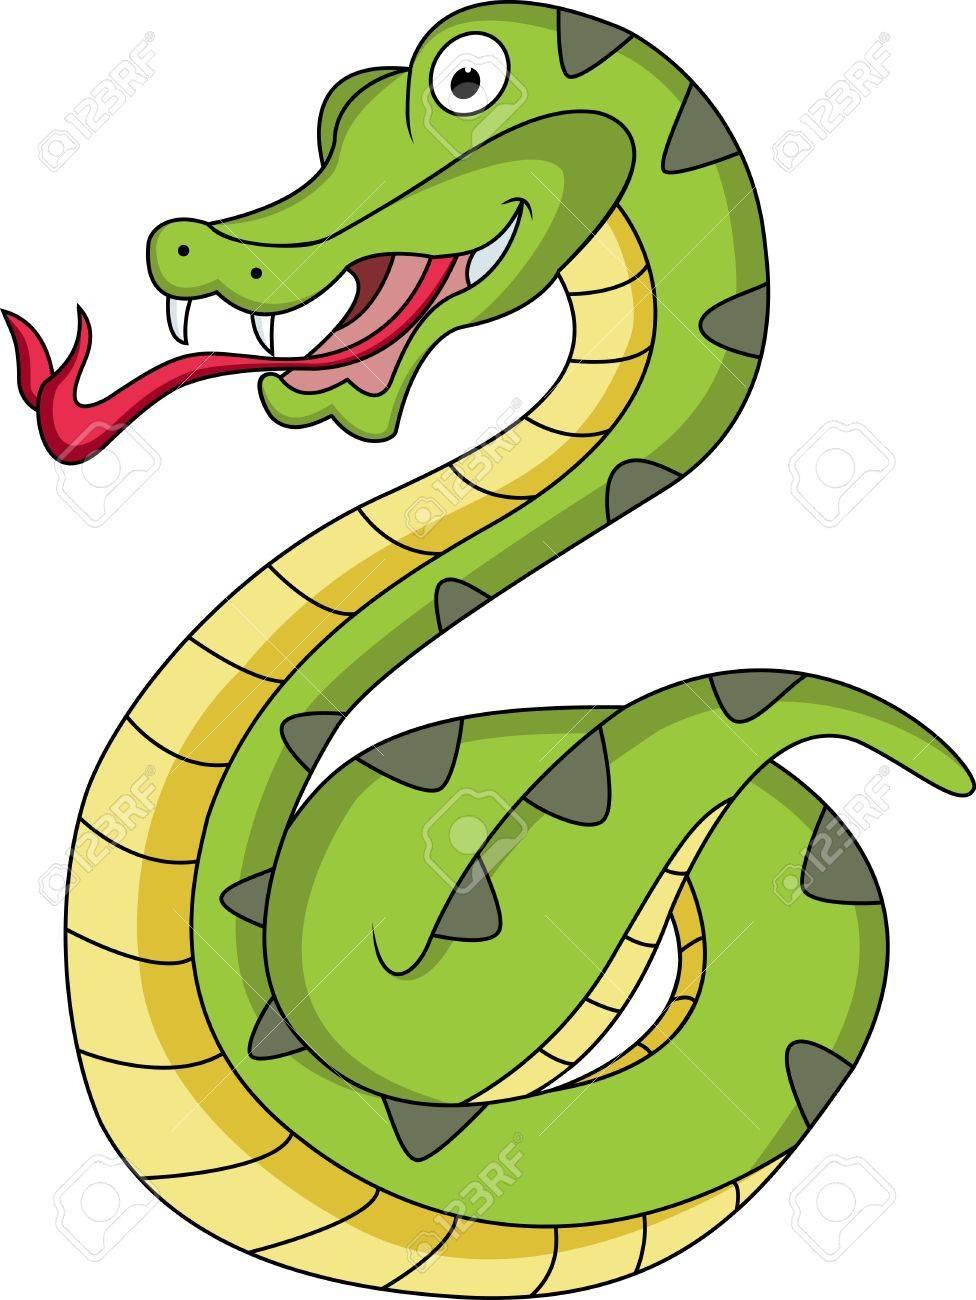 funny snake cartoon Stock Vector - 12542494